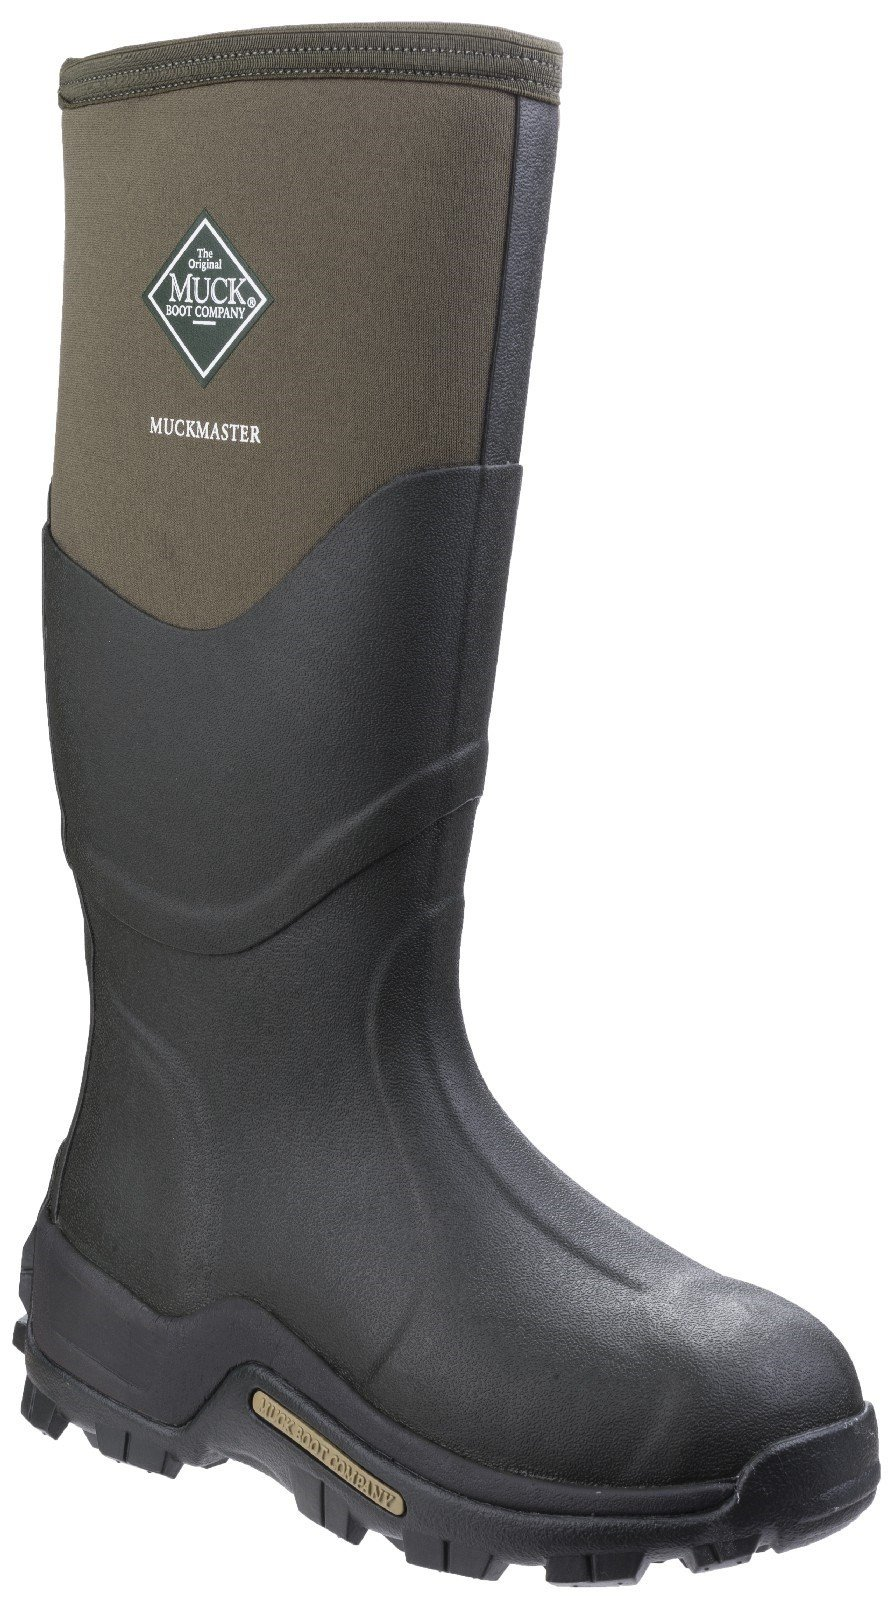 Muck Boots Unisex Muckmaster Hi Wellington Boot Various Colours 23387 - Moss 4